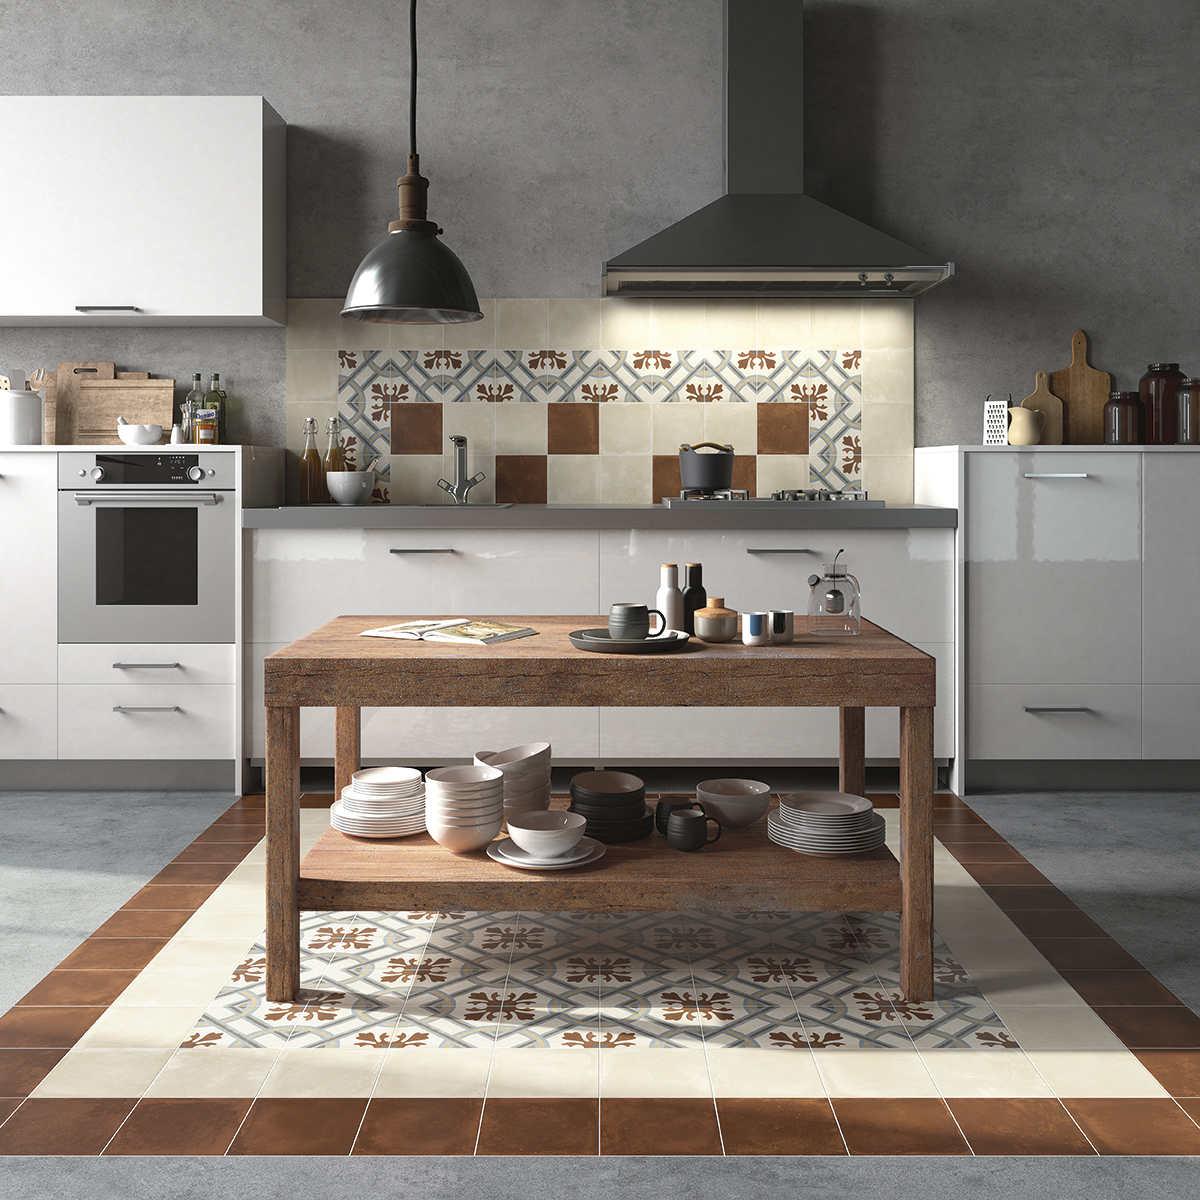 perfect kitchen backsplash tiles